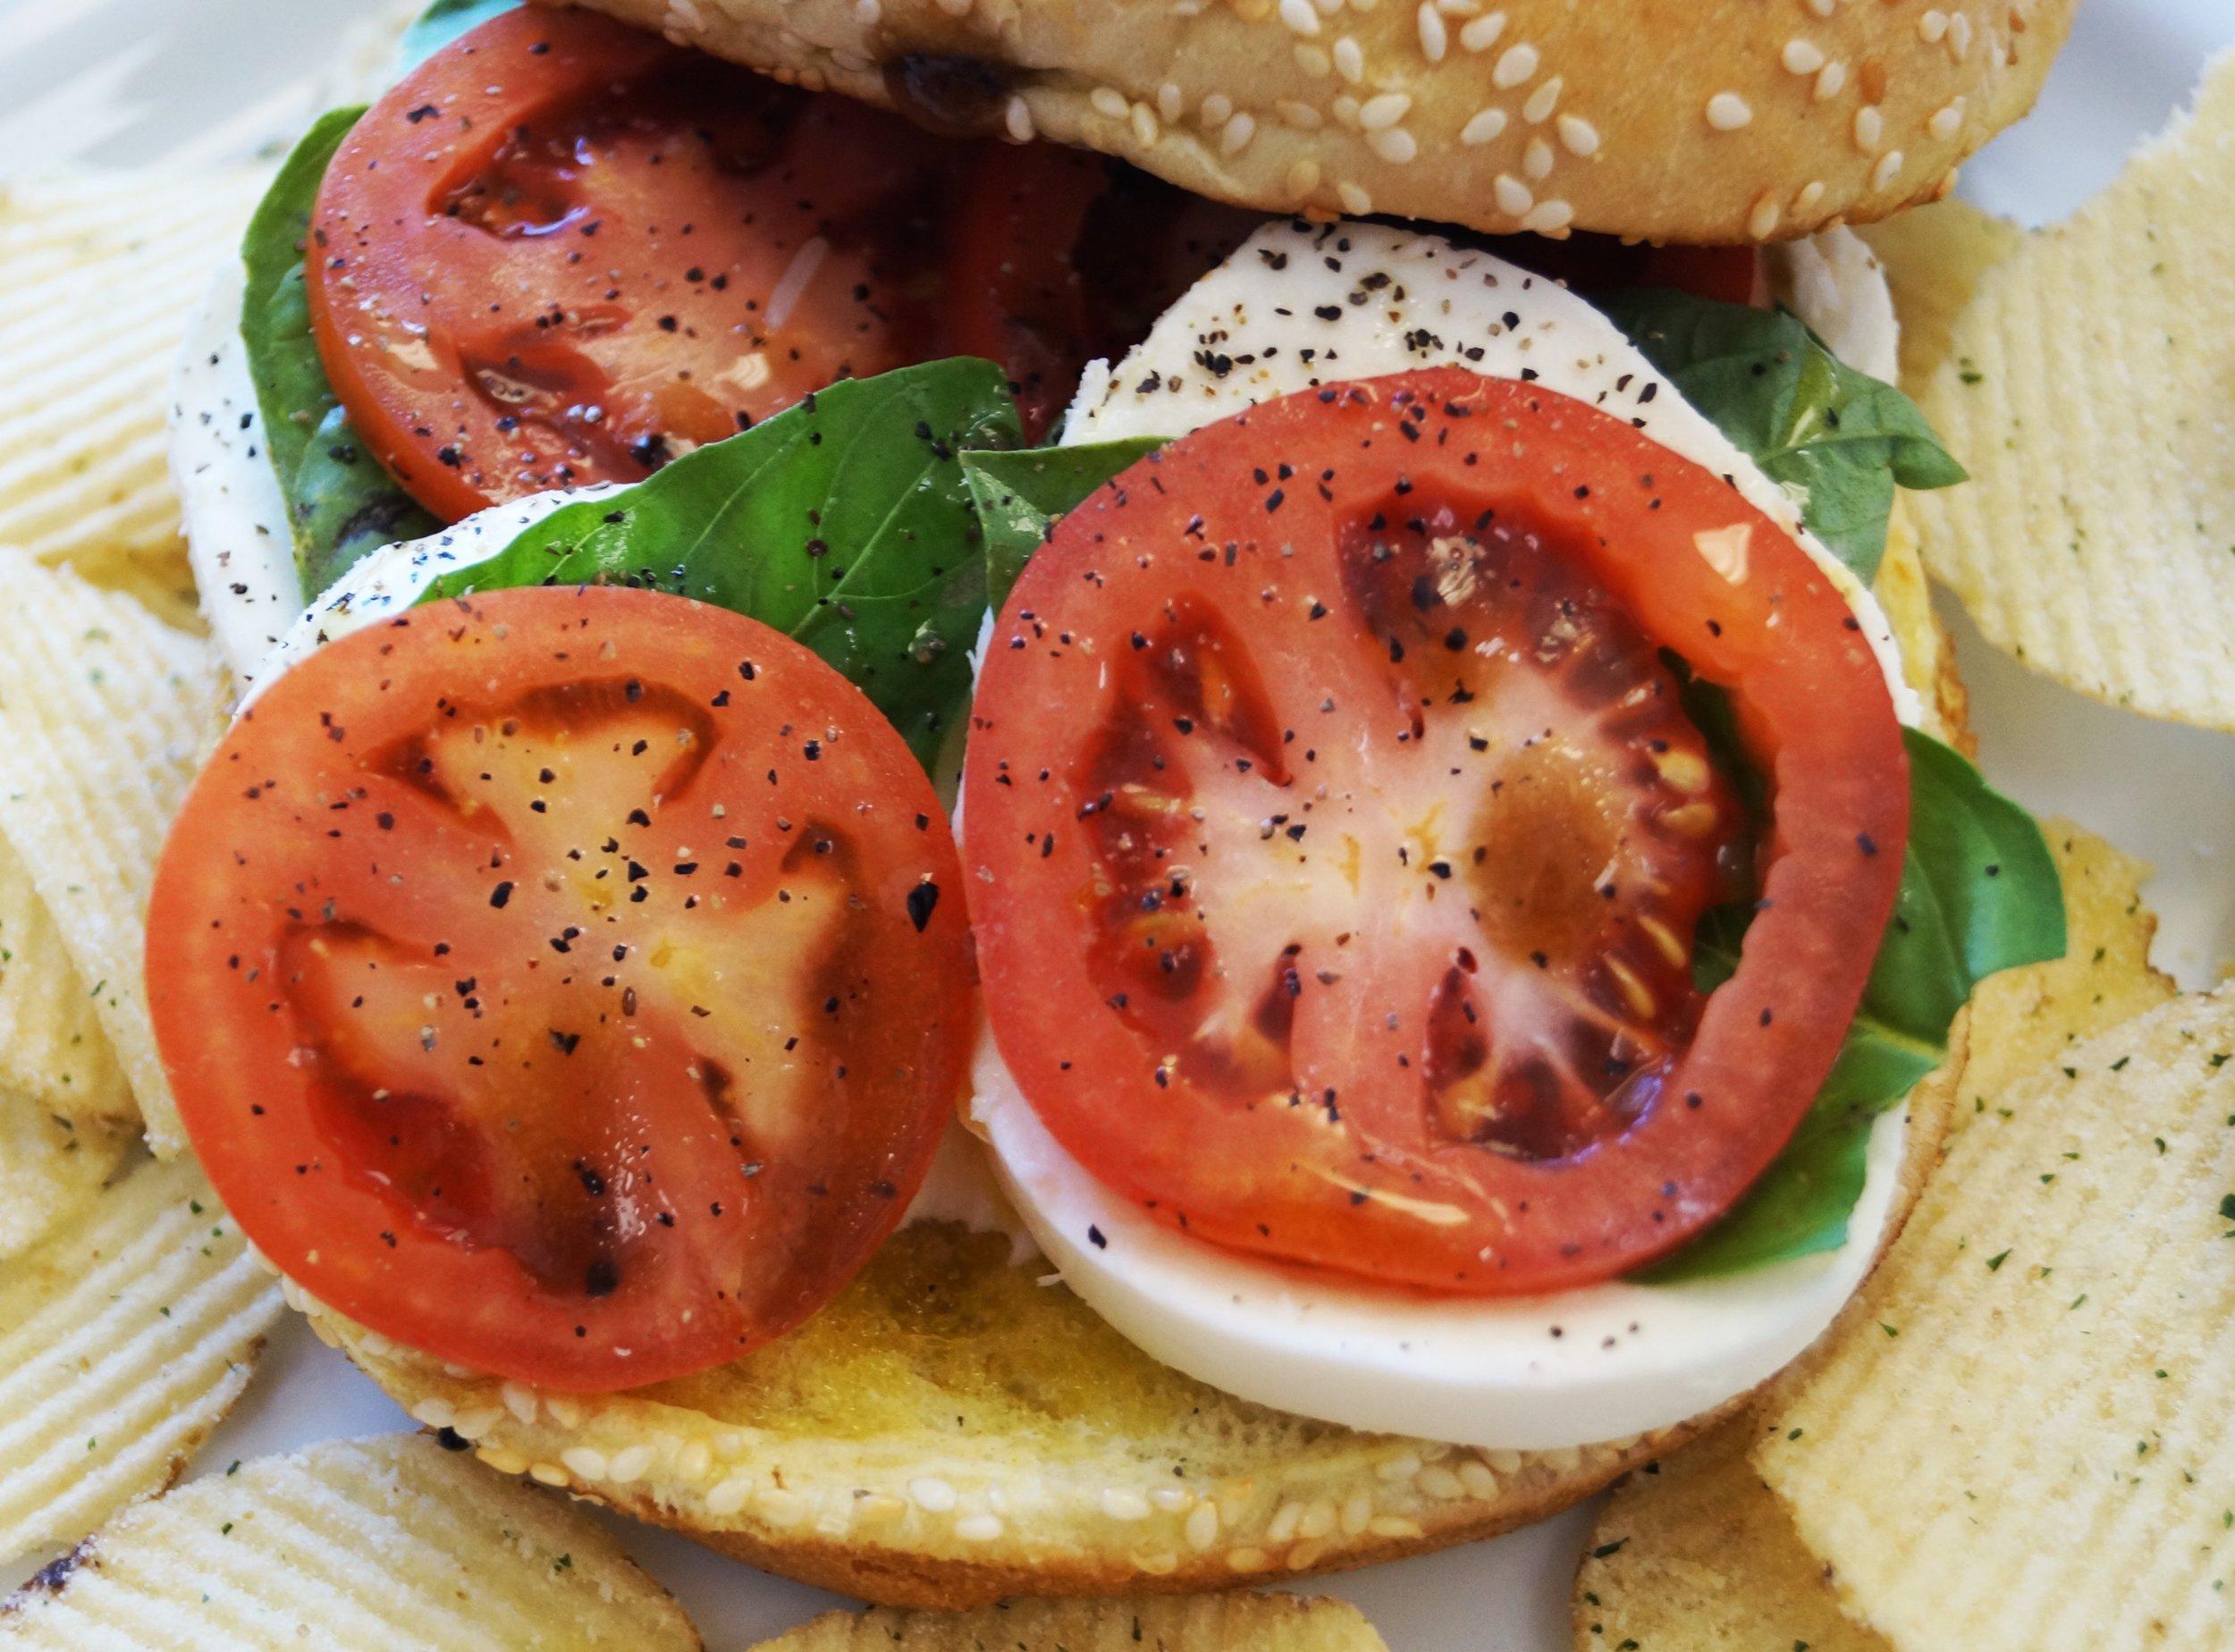 royal-roast-beef-caprese-sandwich-close-up.jpg